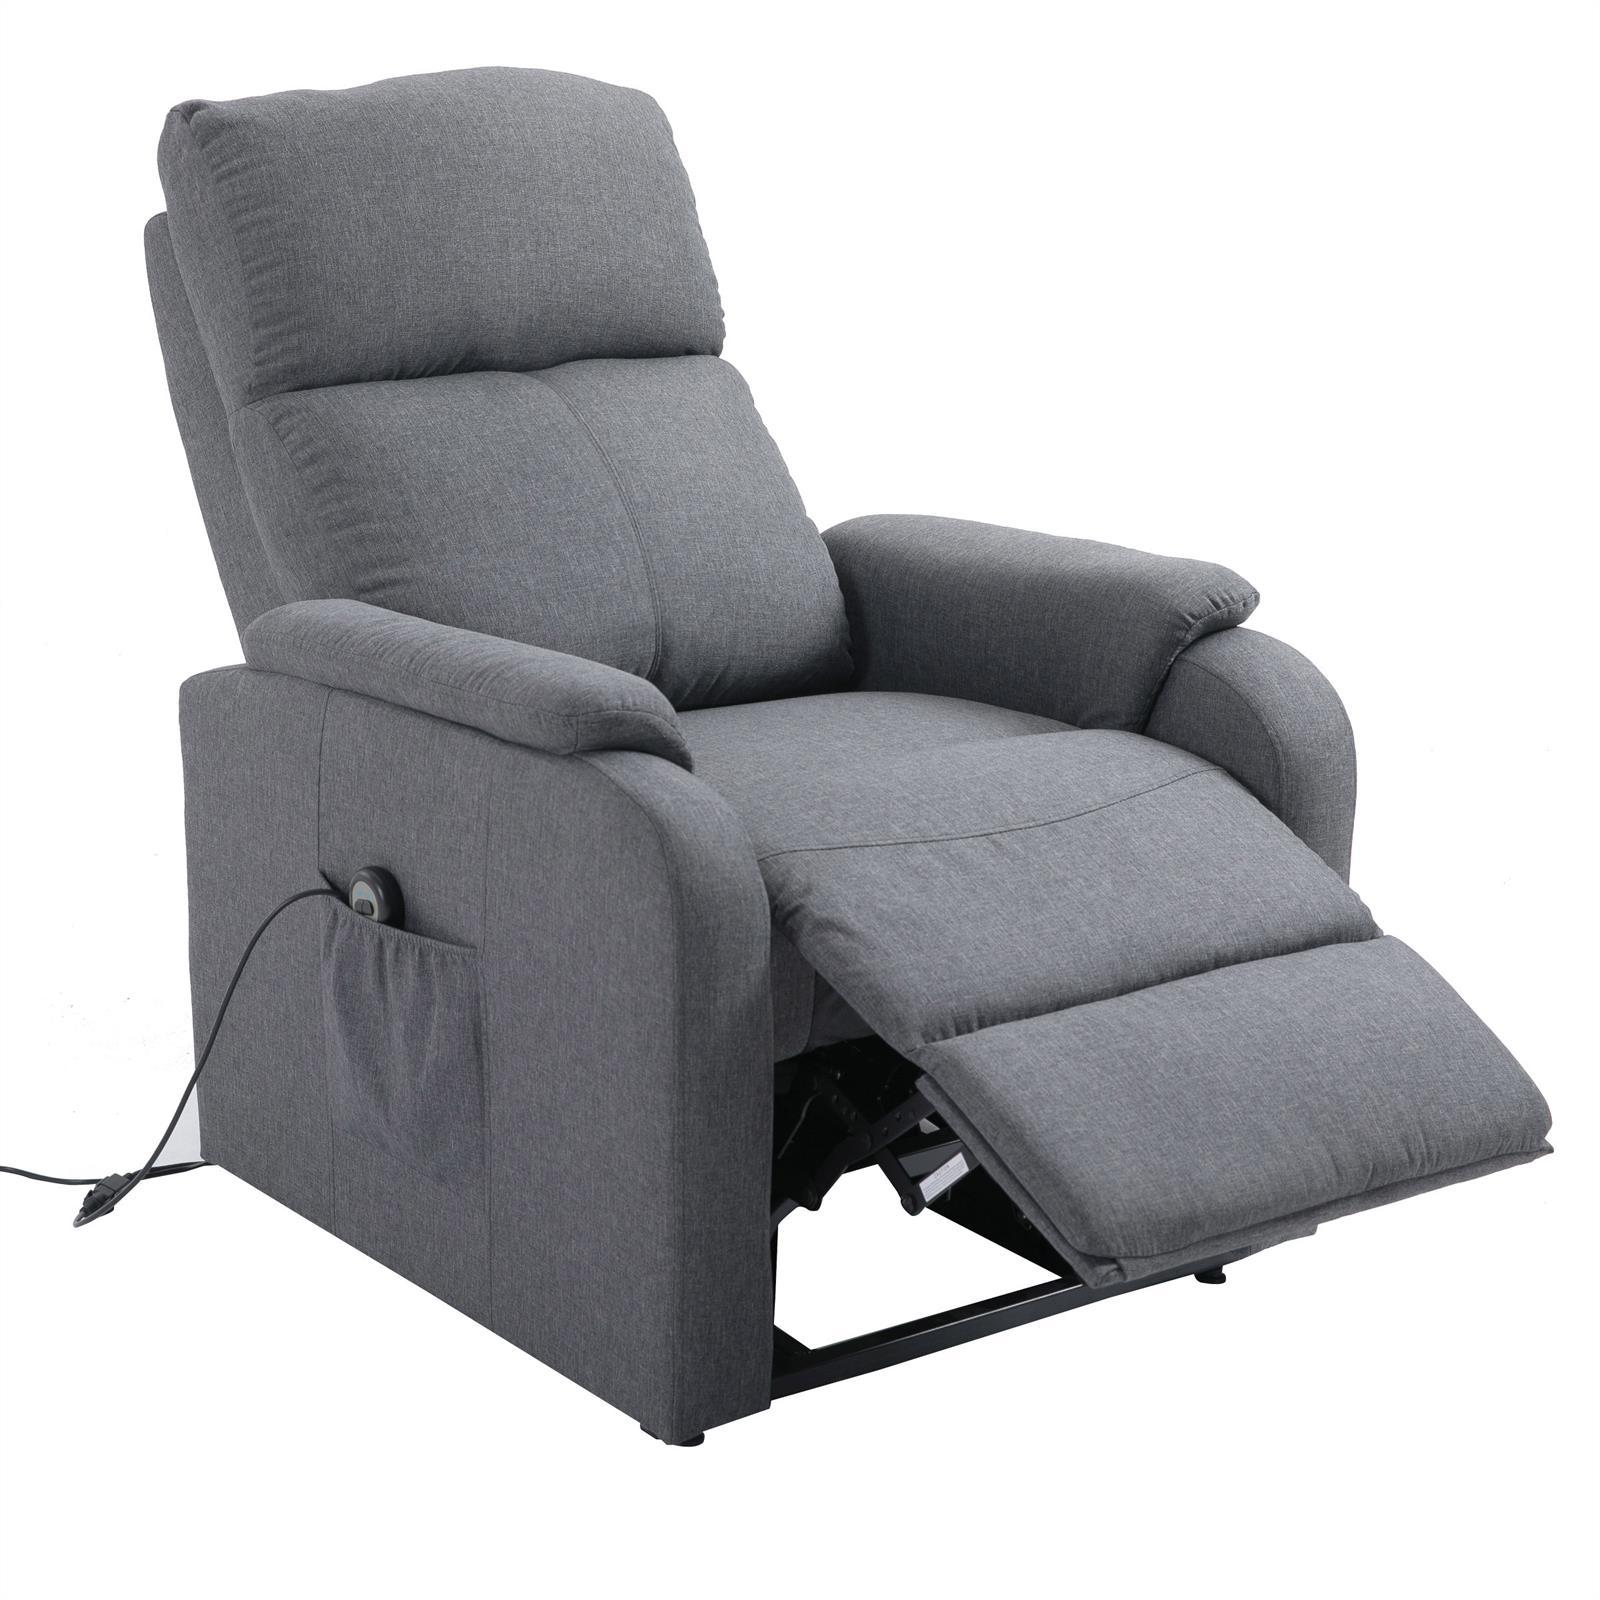 relaxsessel fernsehsessel tv ruhe sessel mit elektrischer aufstehfunktion ebay. Black Bedroom Furniture Sets. Home Design Ideas